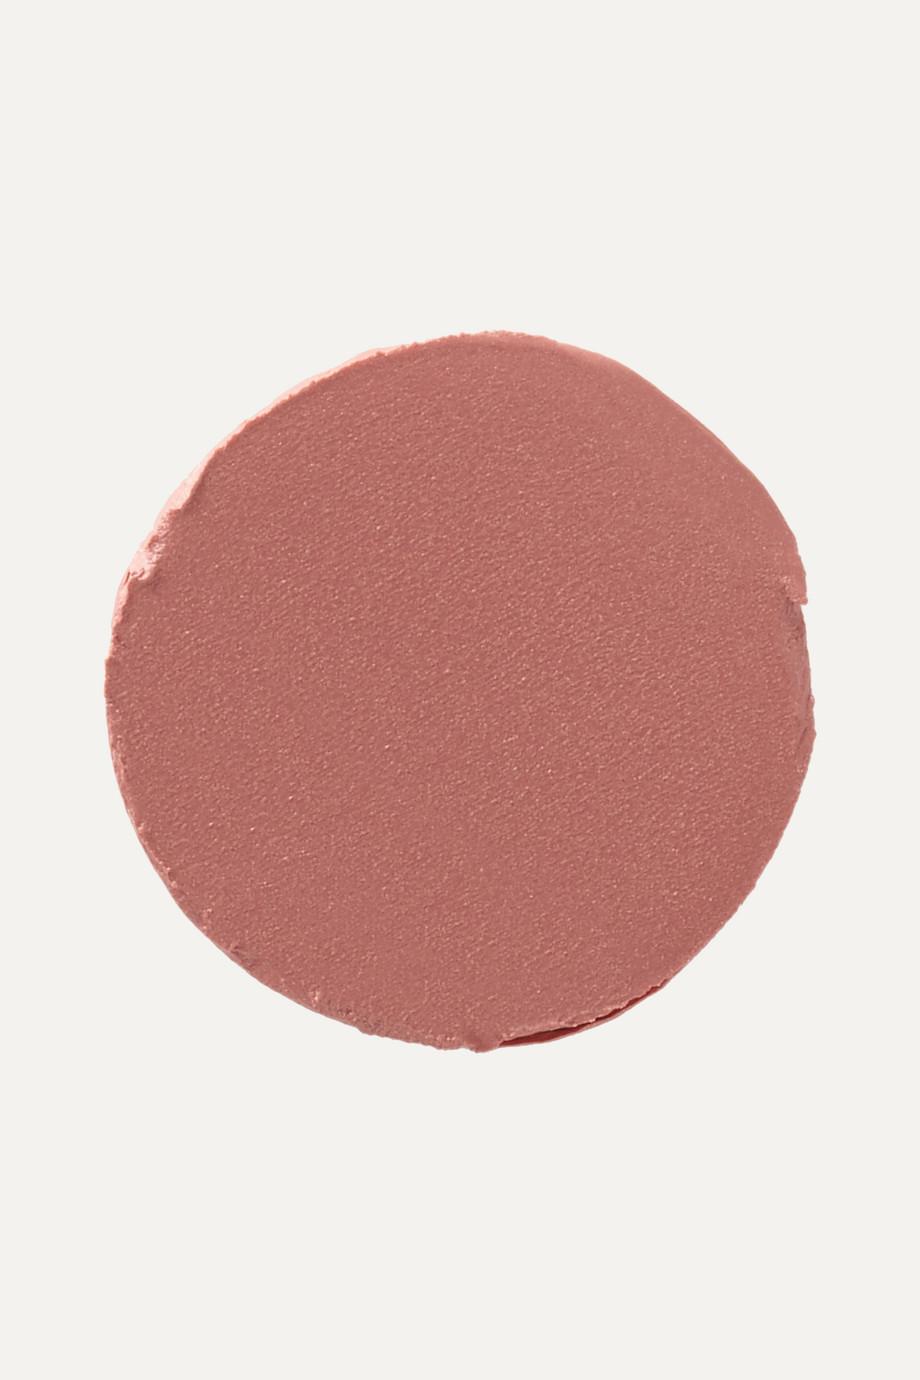 Chantecaille Lipstick - Mirage